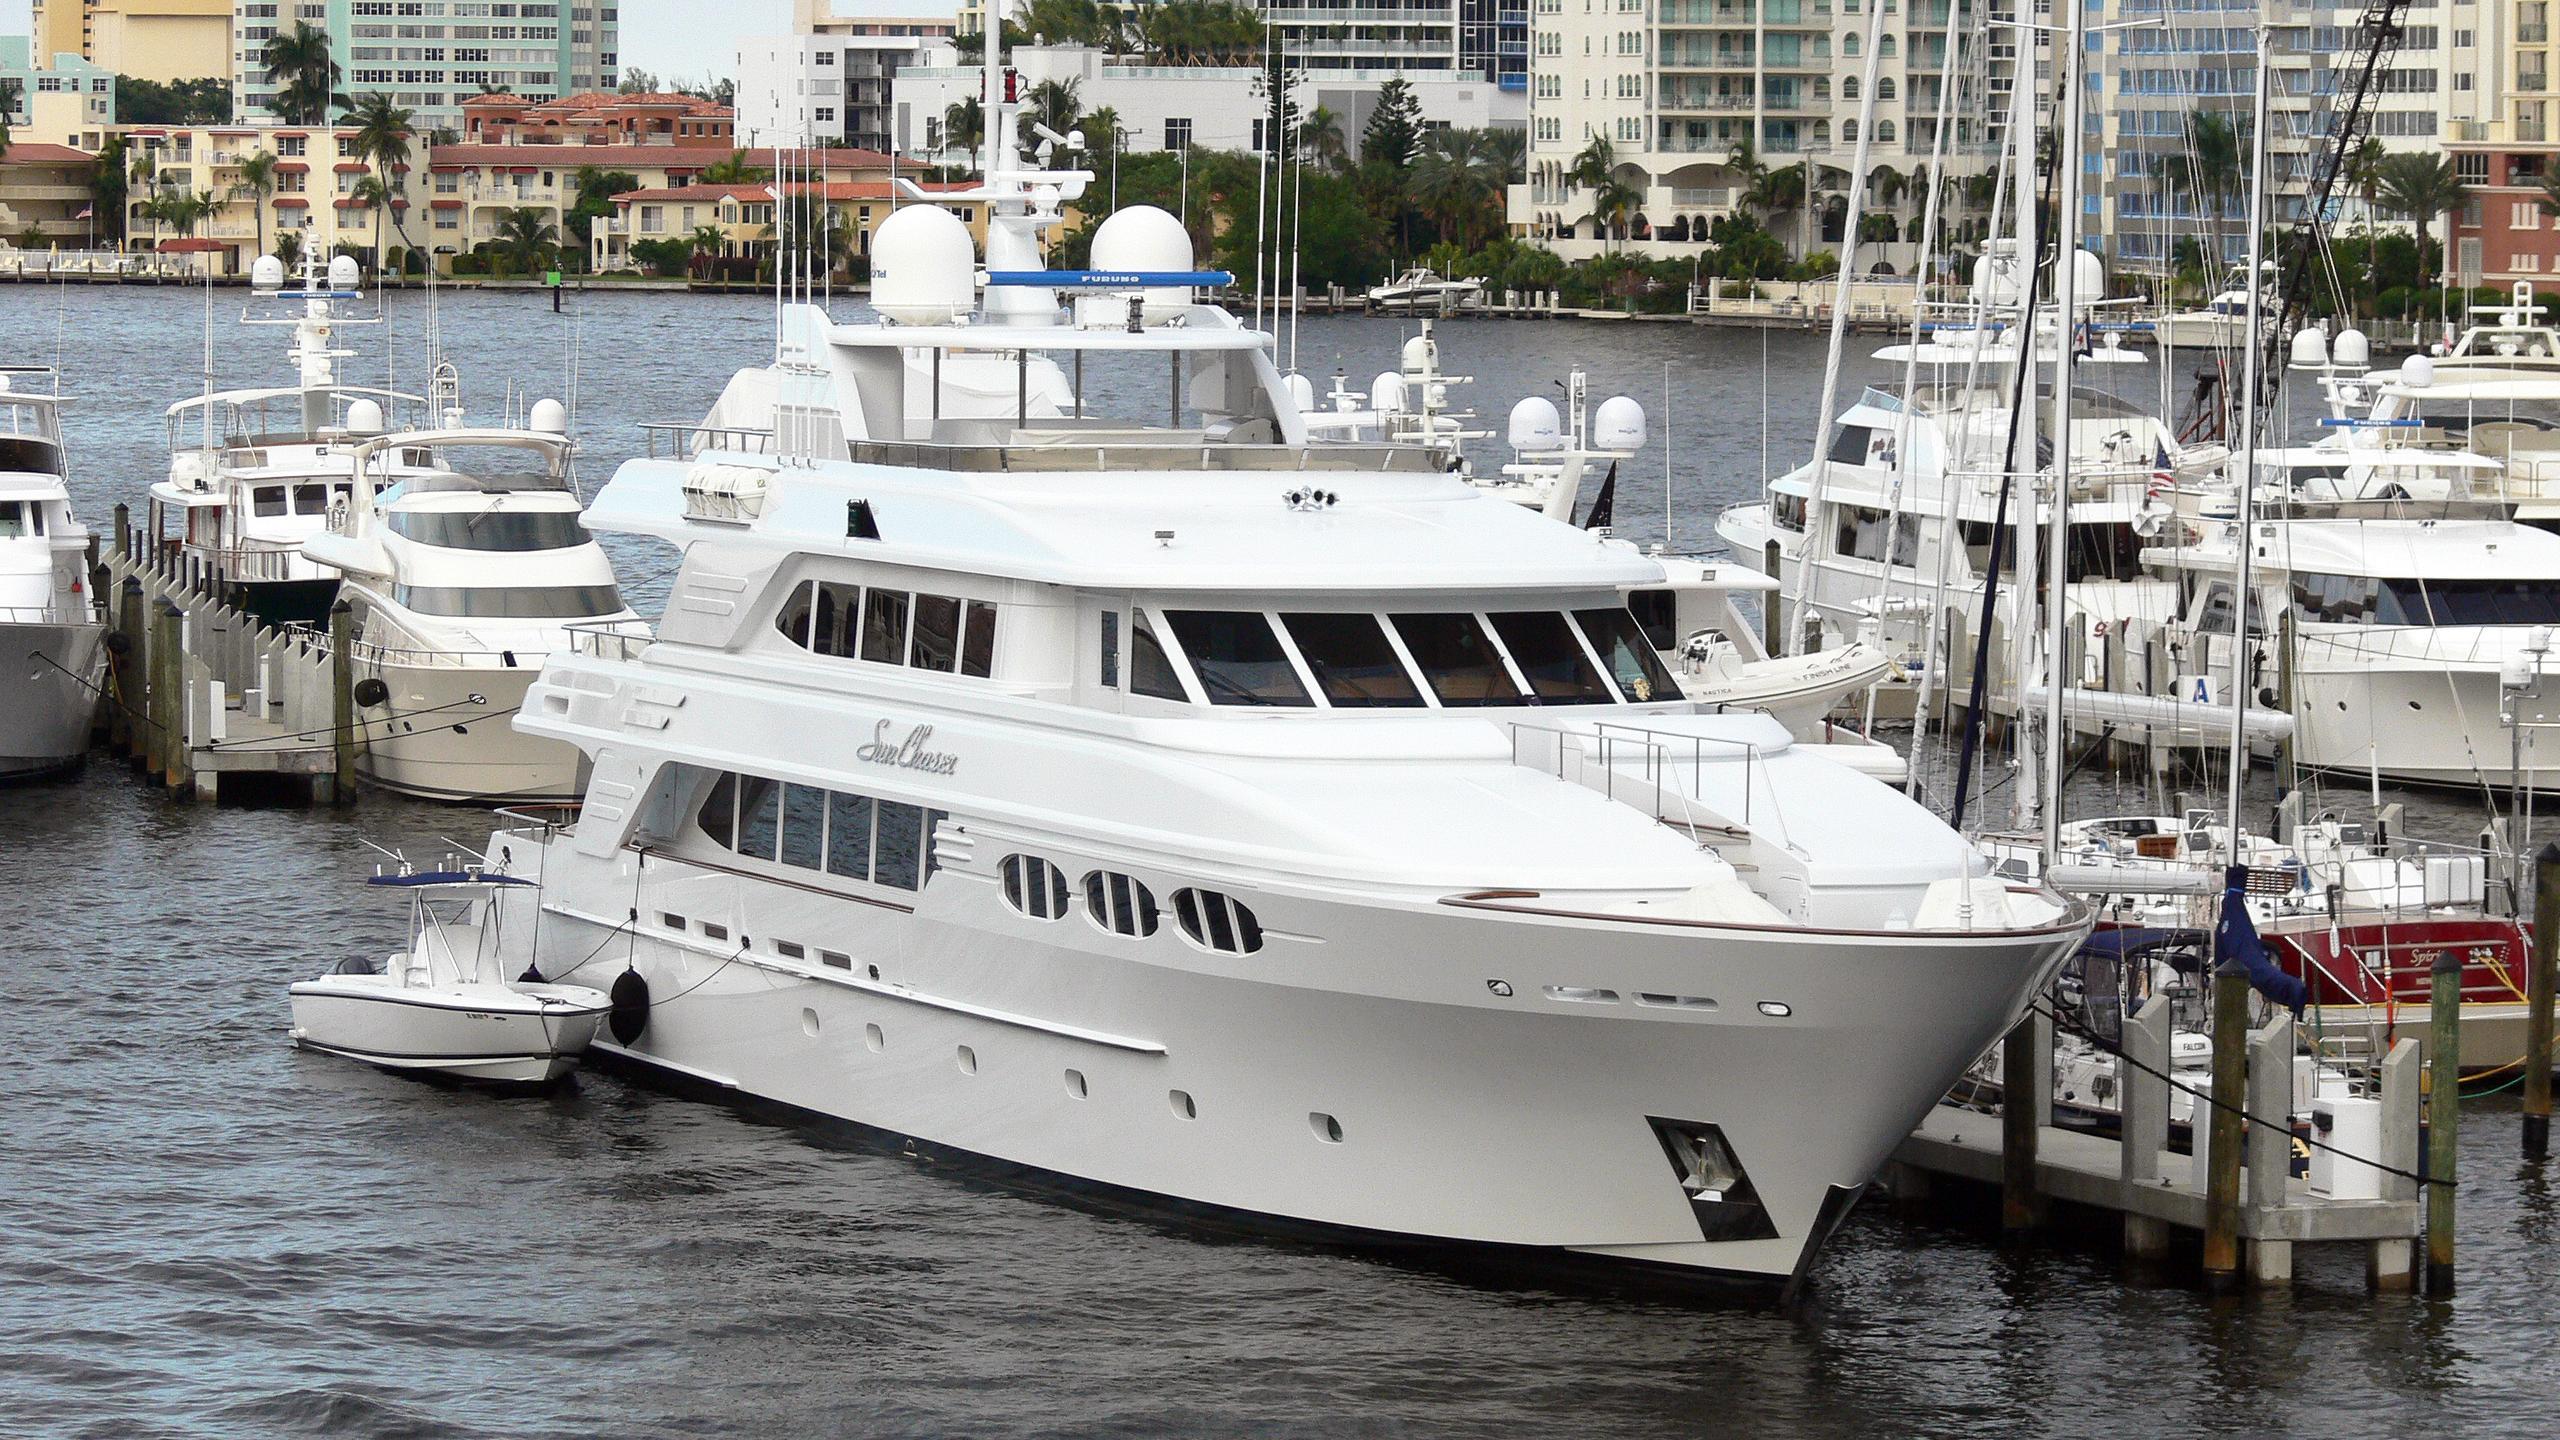 sun-chaser-motor-yacht-richmond-142-2006-43m-moored-half-profile